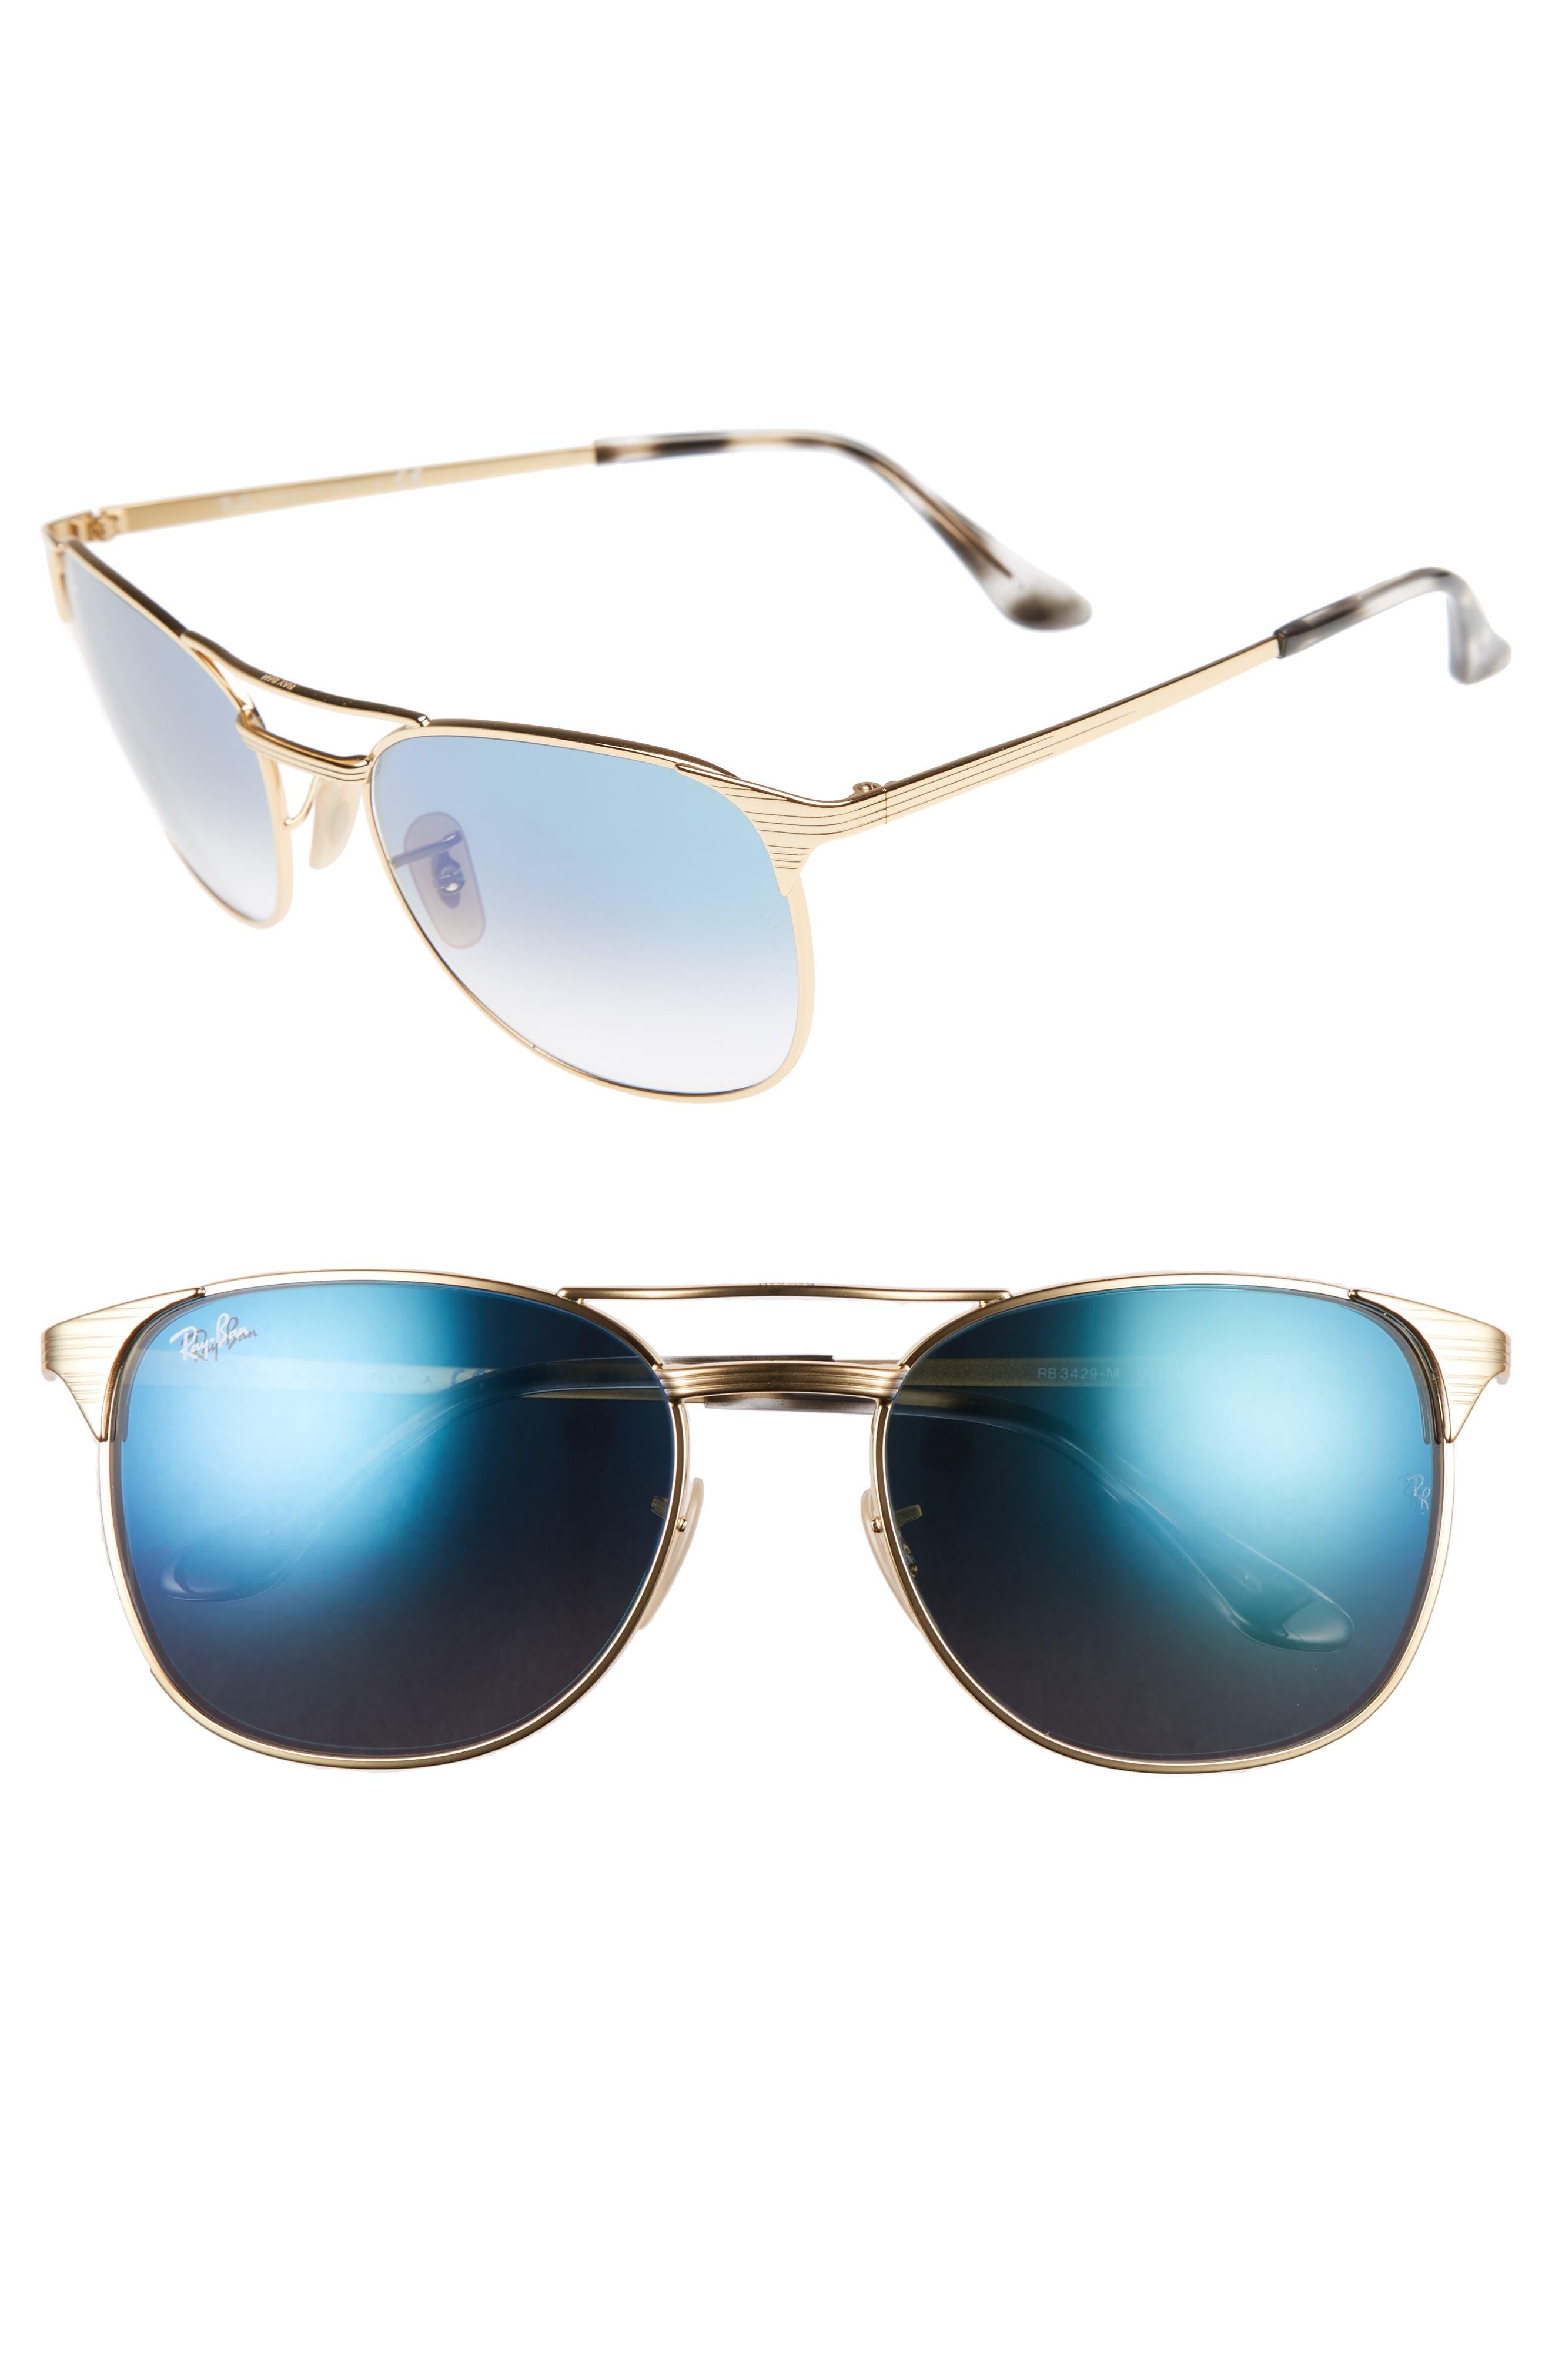 Ray-Ban Signet 5m Square Sunglasses - Gold/gradient Blue